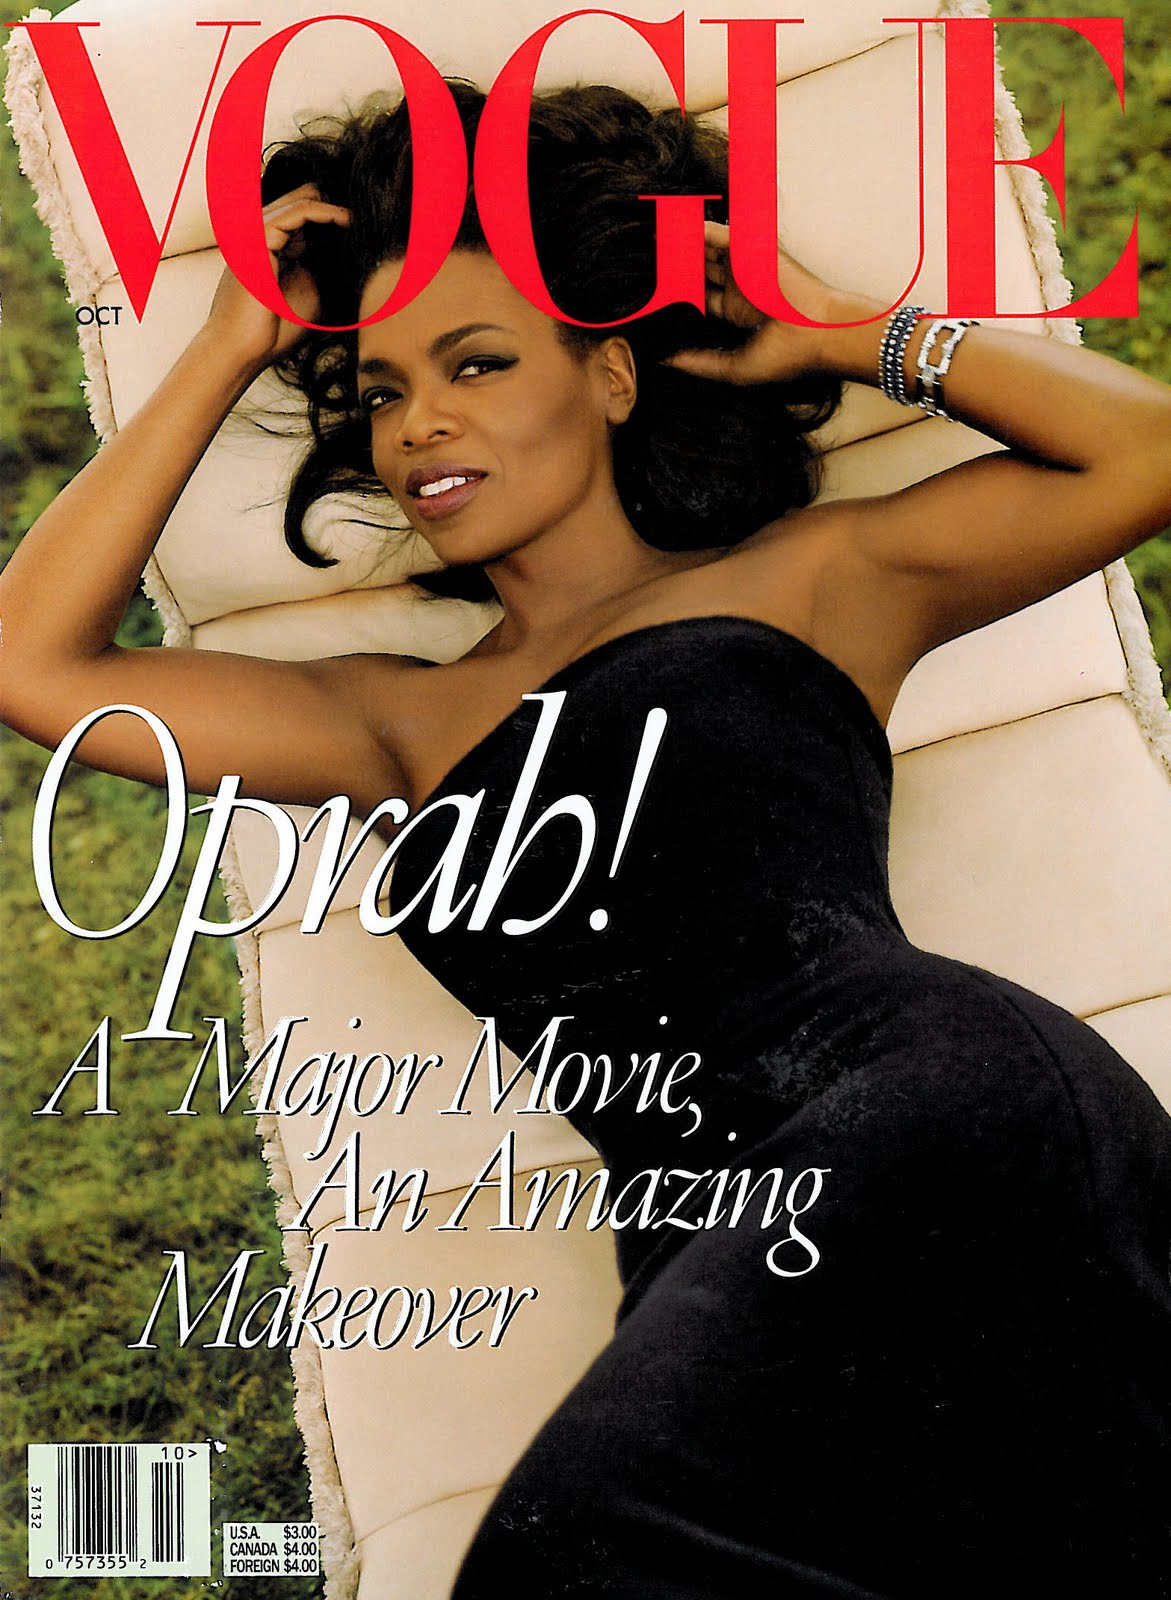 http://4.bp.blogspot.com/-DU-Sdwyk1r4/Td0RSTQ8UZI/AAAAAAAAEaM/uYSRpi6MlQo/s1600/Vintage-Vogue-Oprah.jpg